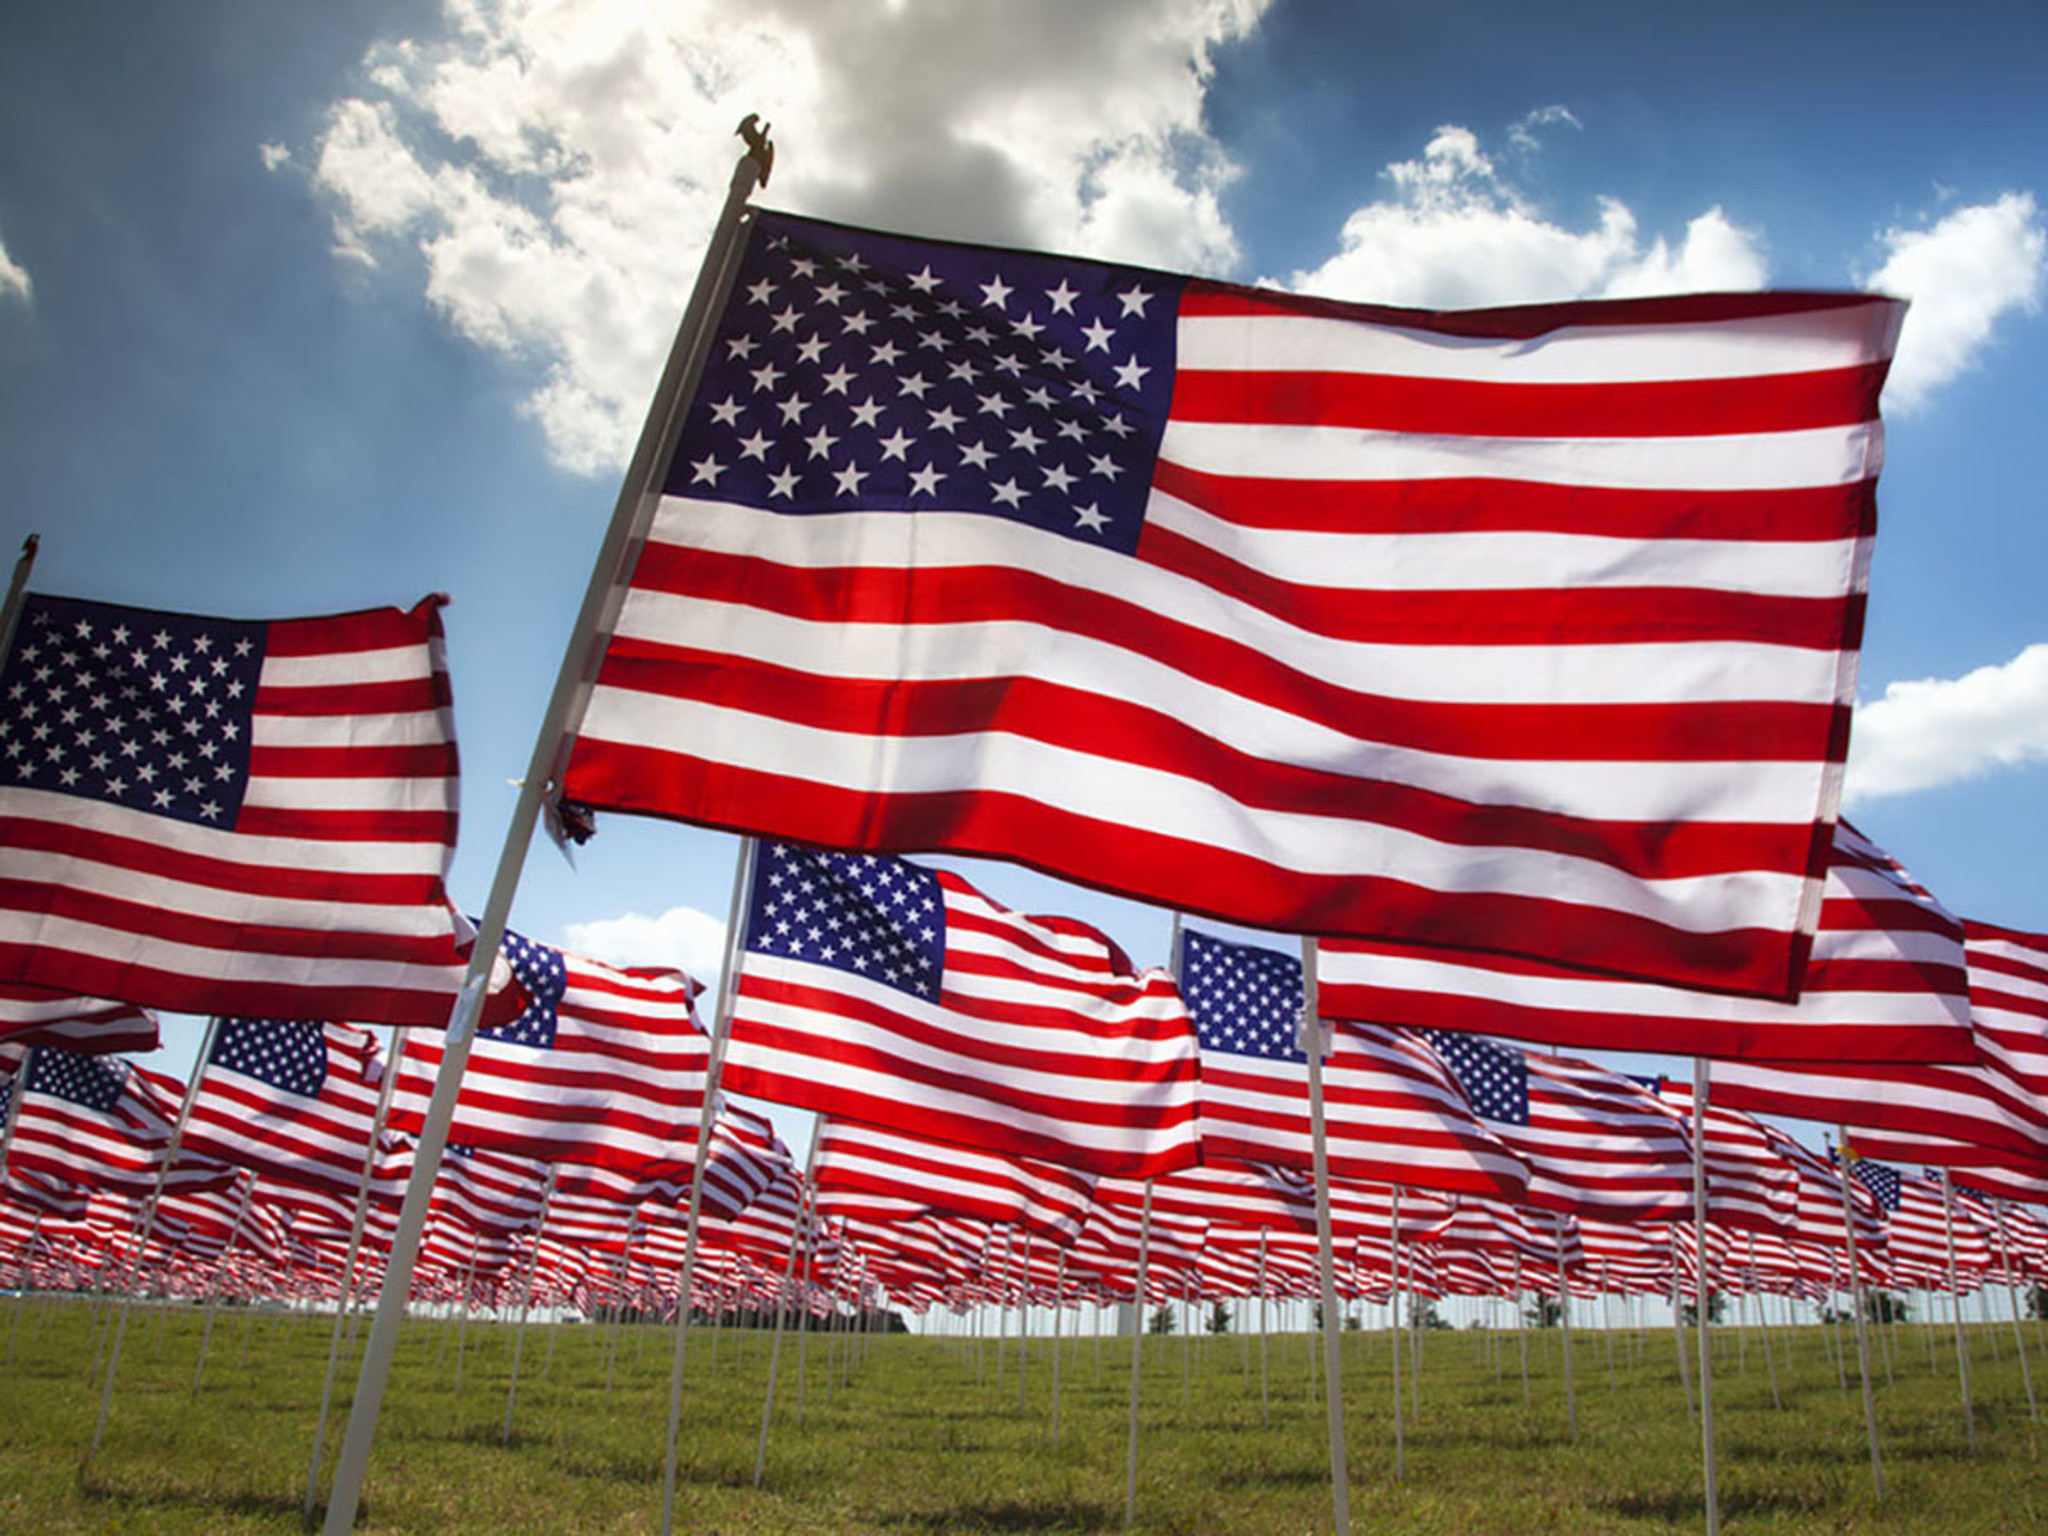 USA Patriotic Decorations